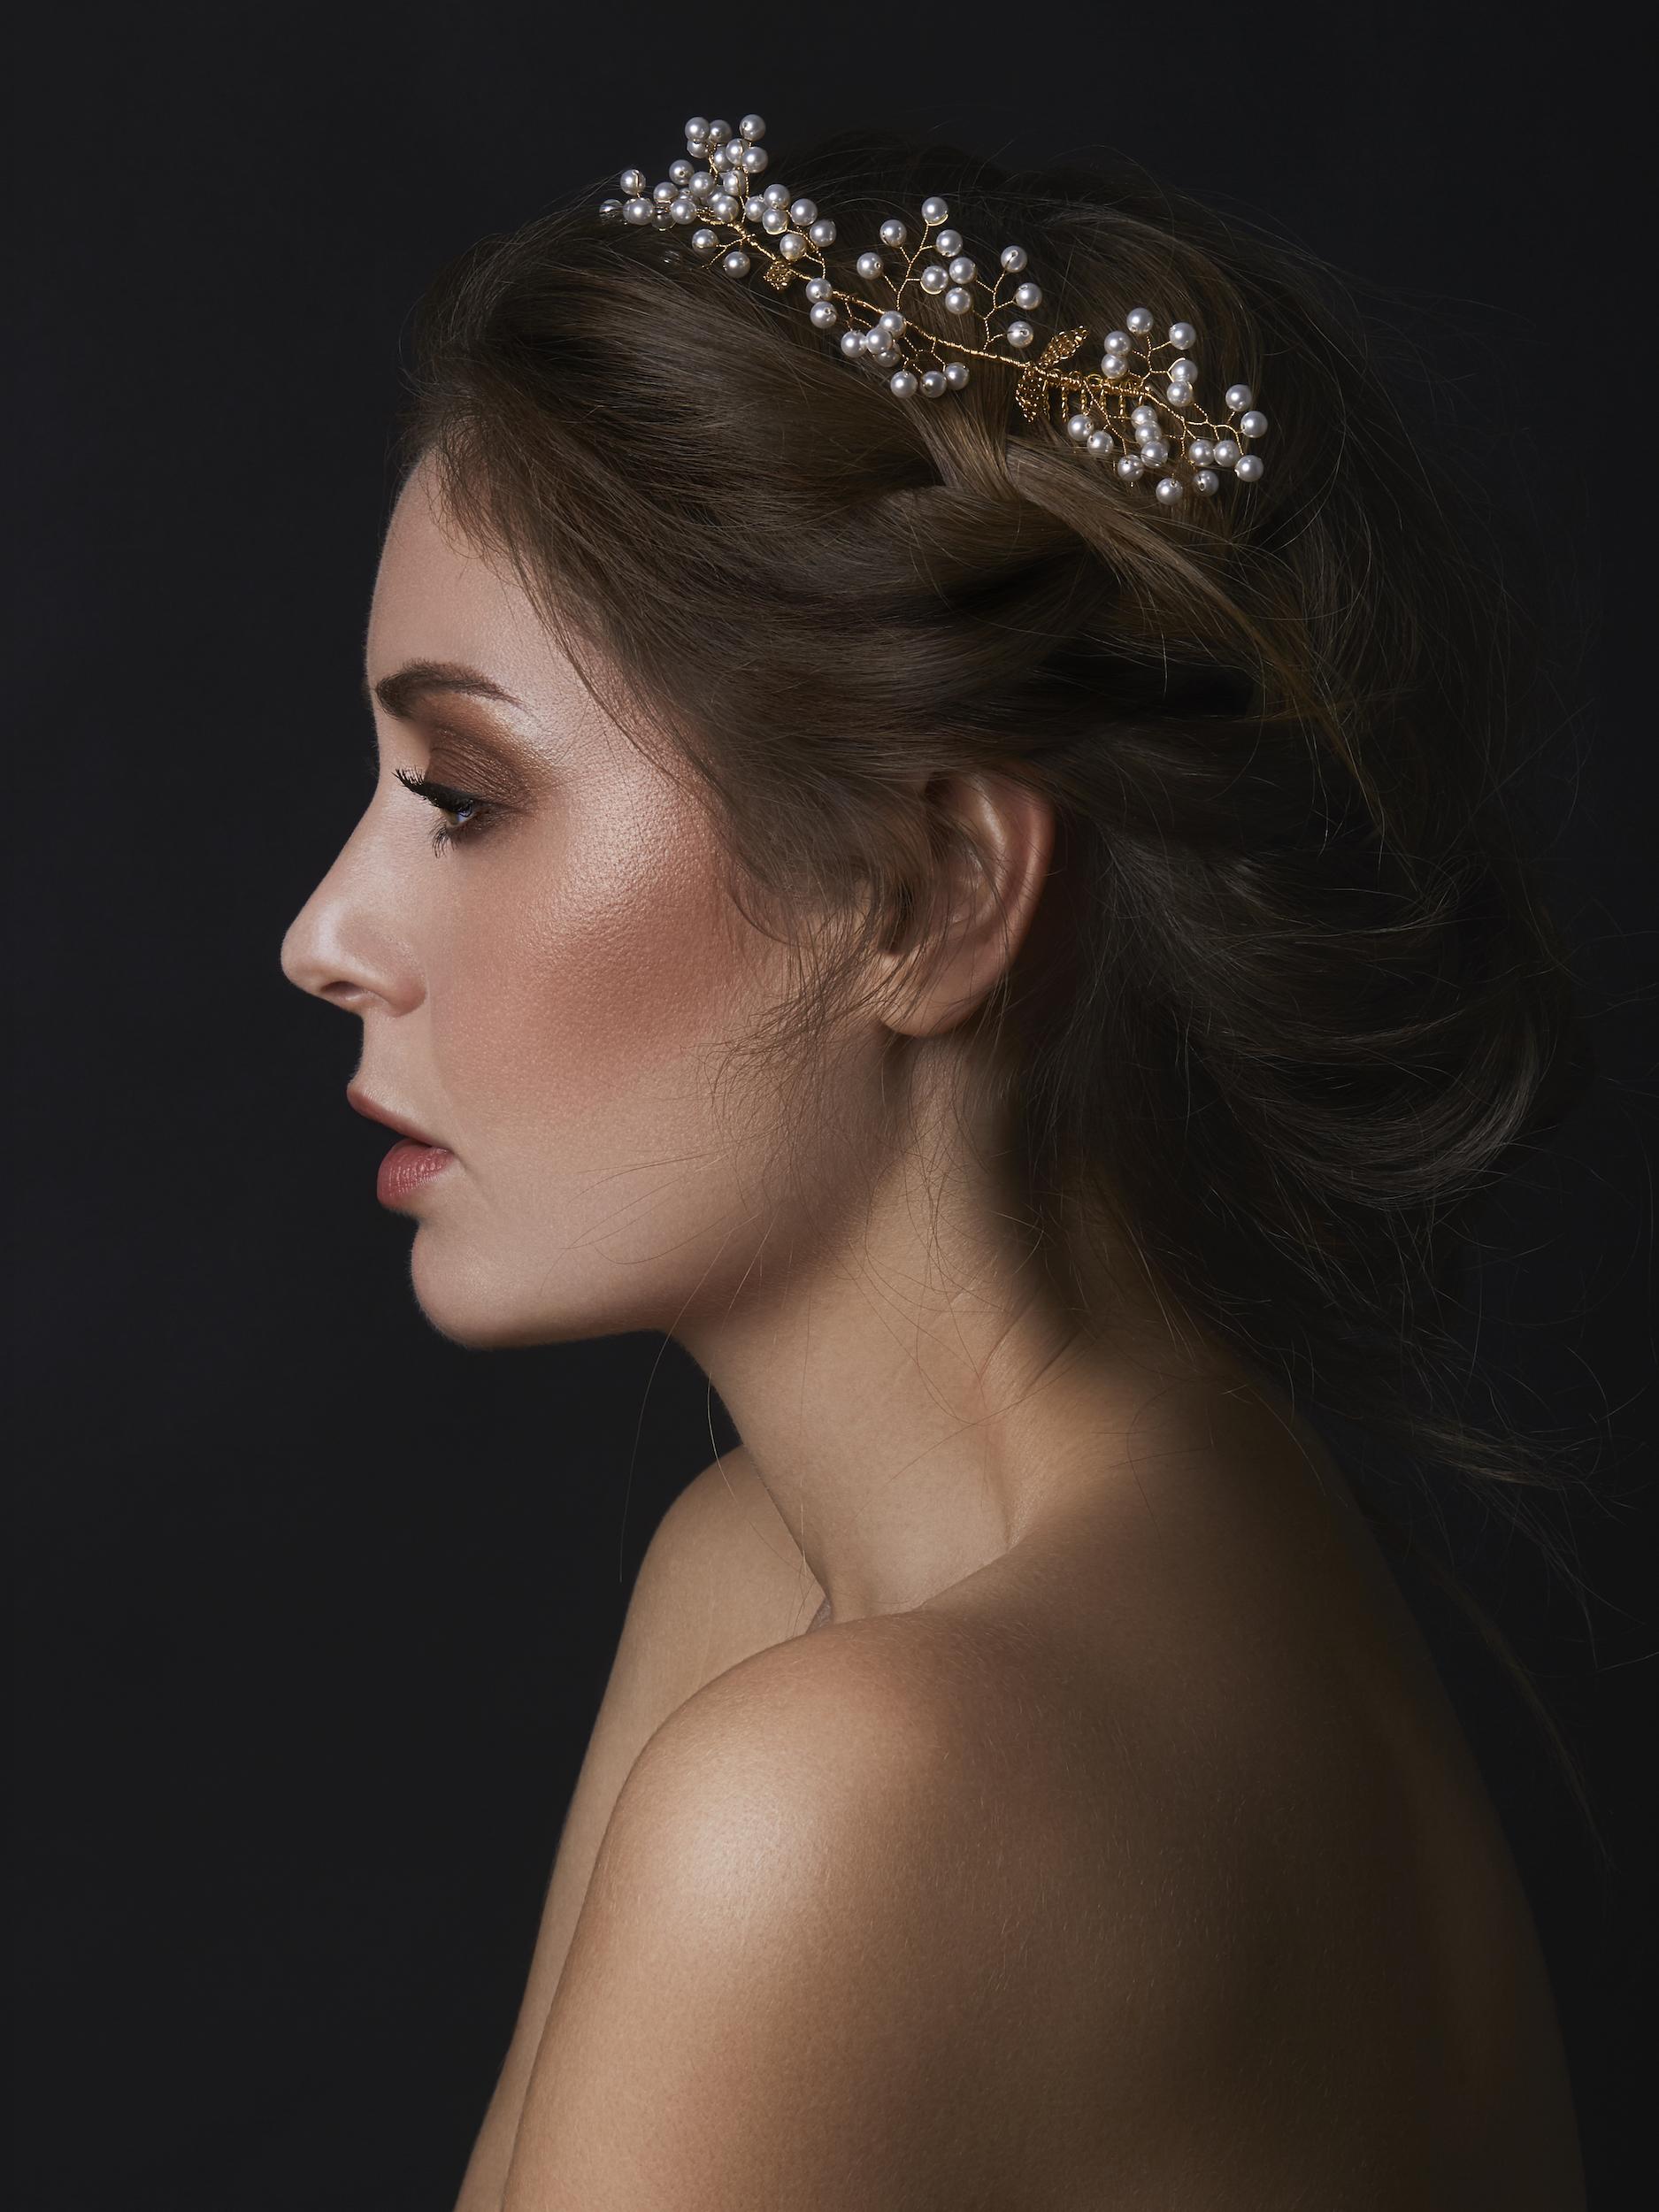 Beauty_Hair_Bride14